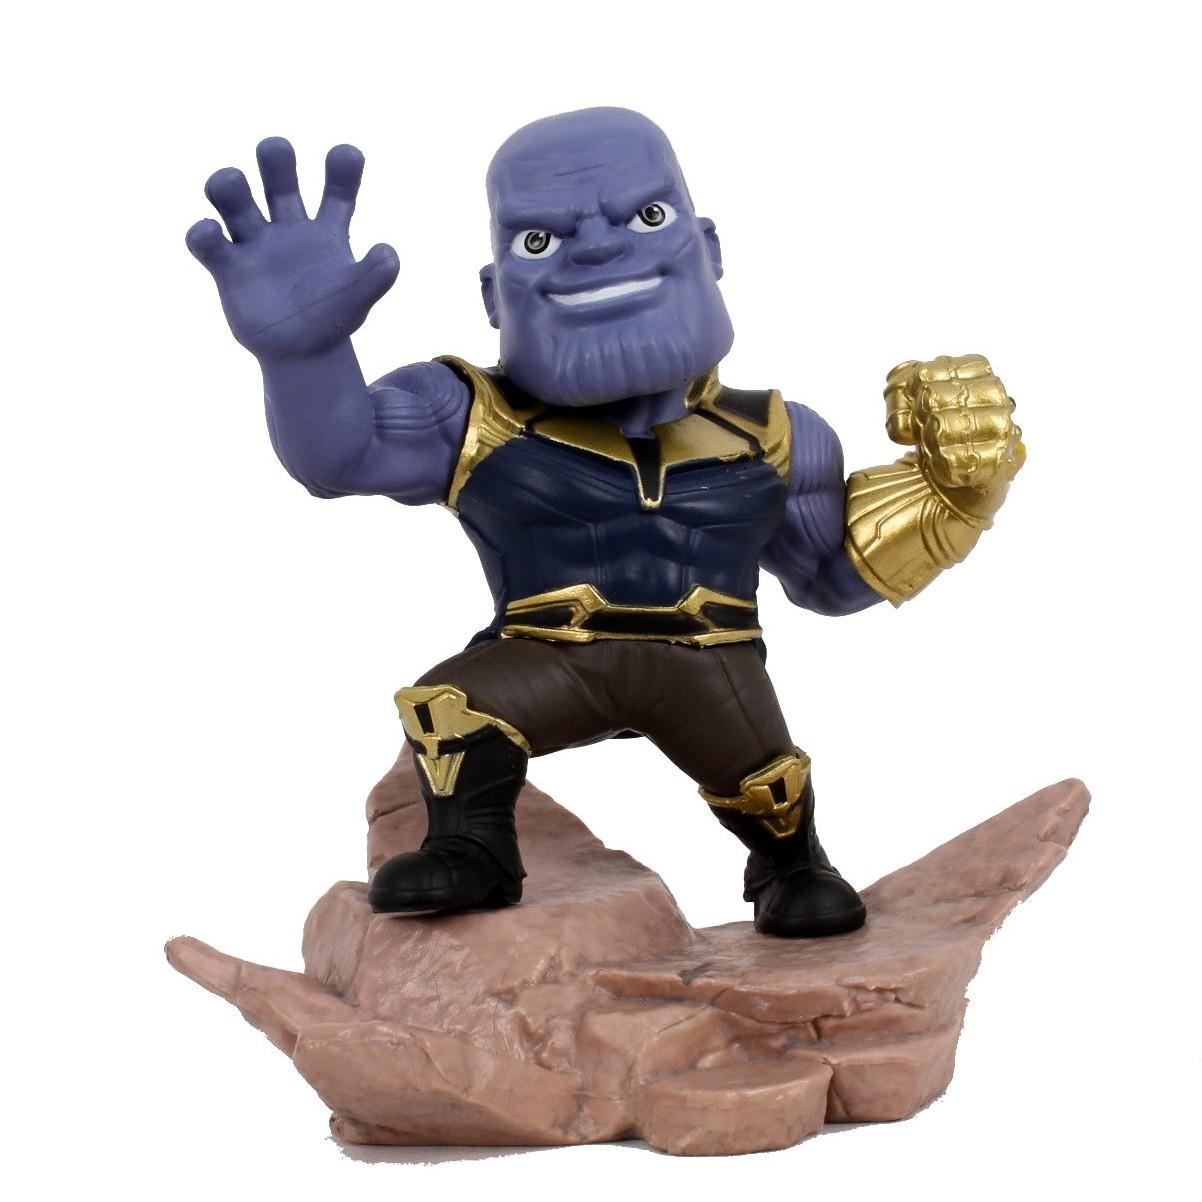 Marvel Avengers: Infinity War Thanos 10cm statula